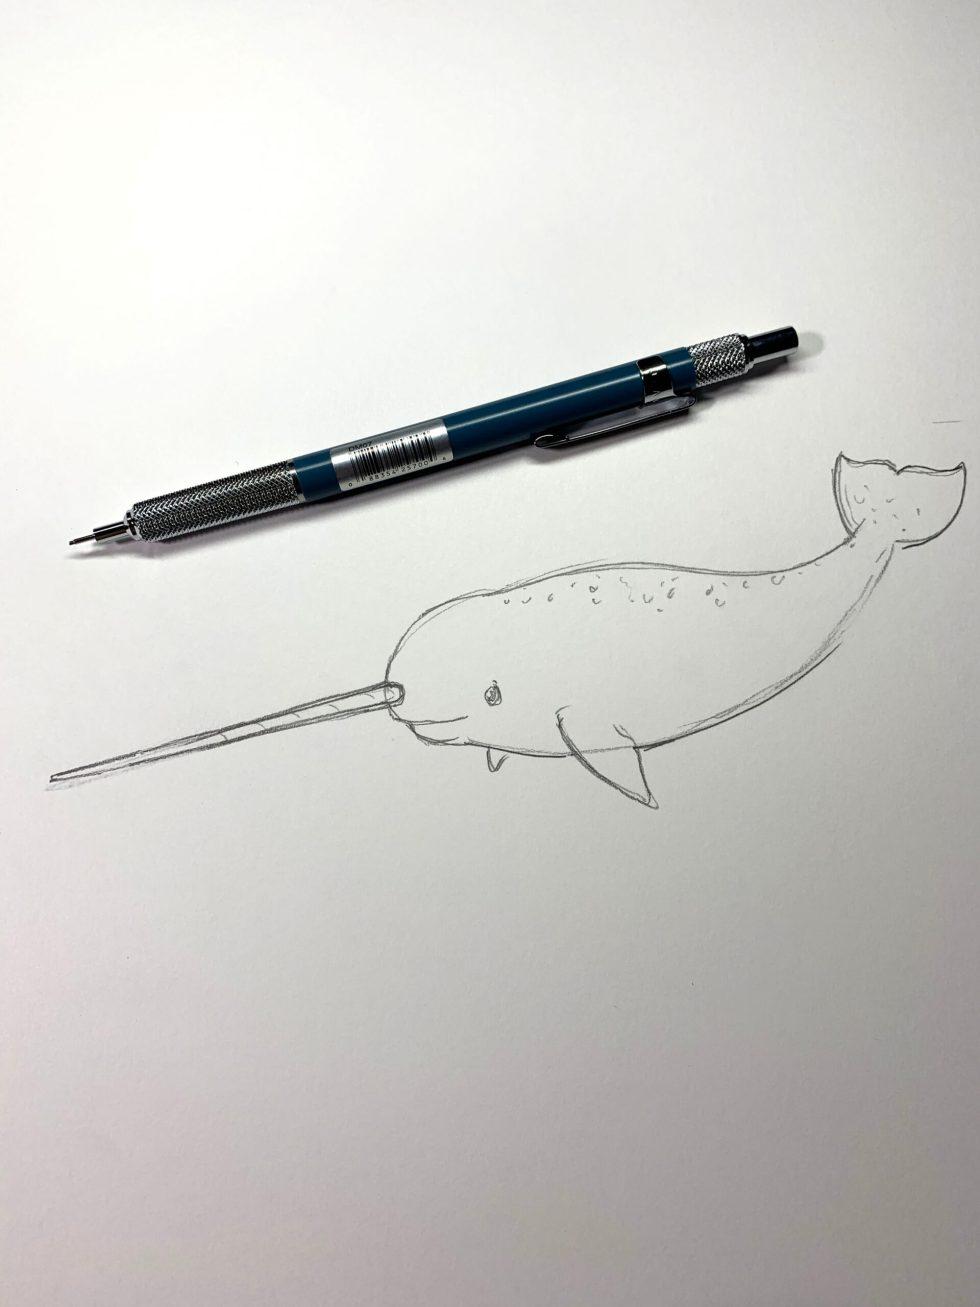 Alvin Draft/Matic .7mm Pencil Image 1